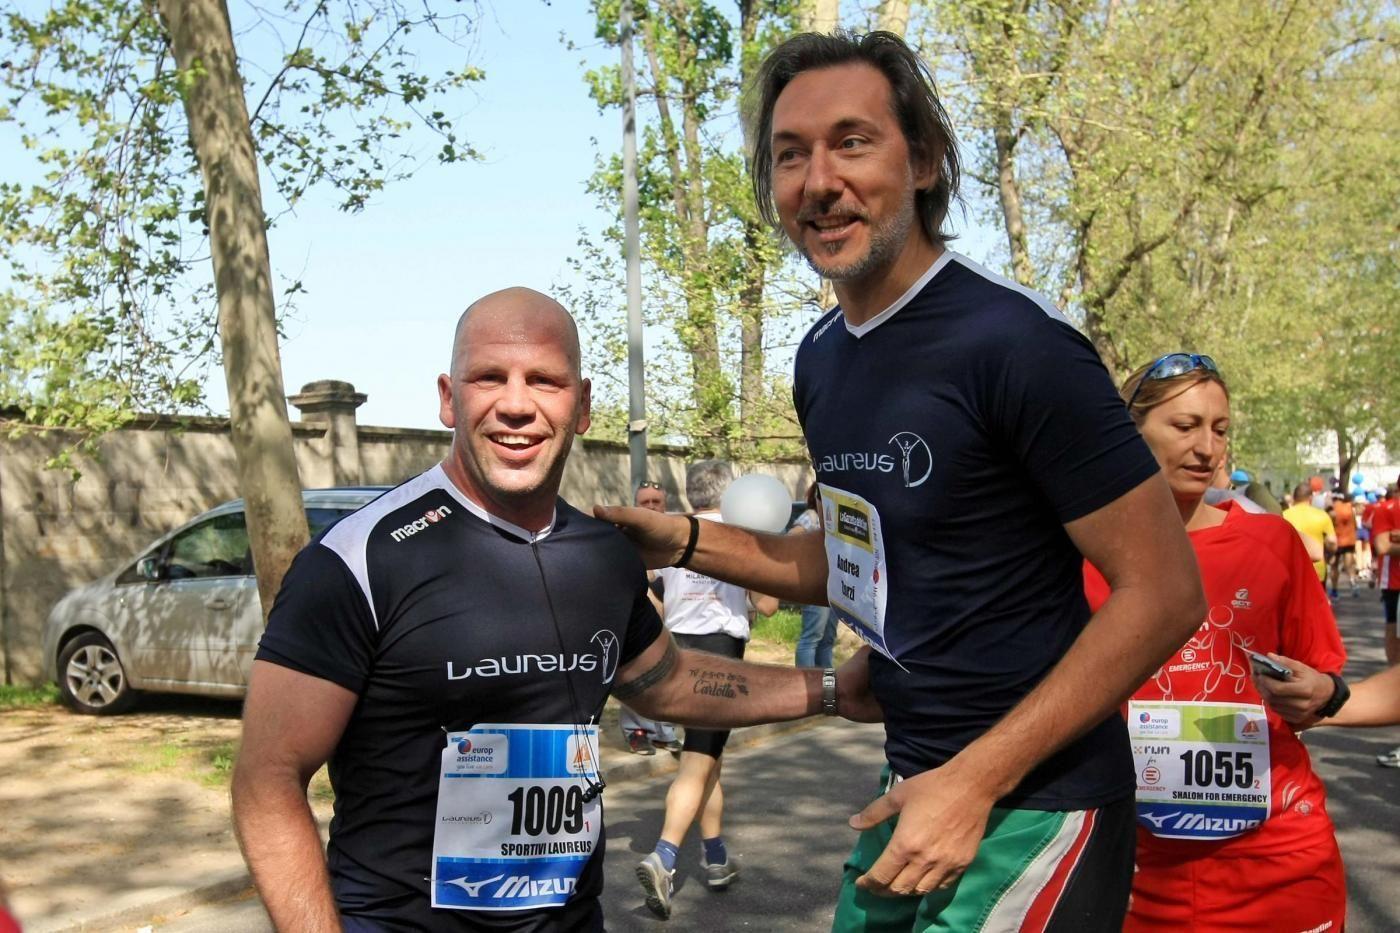 Milano City Marathon 2011